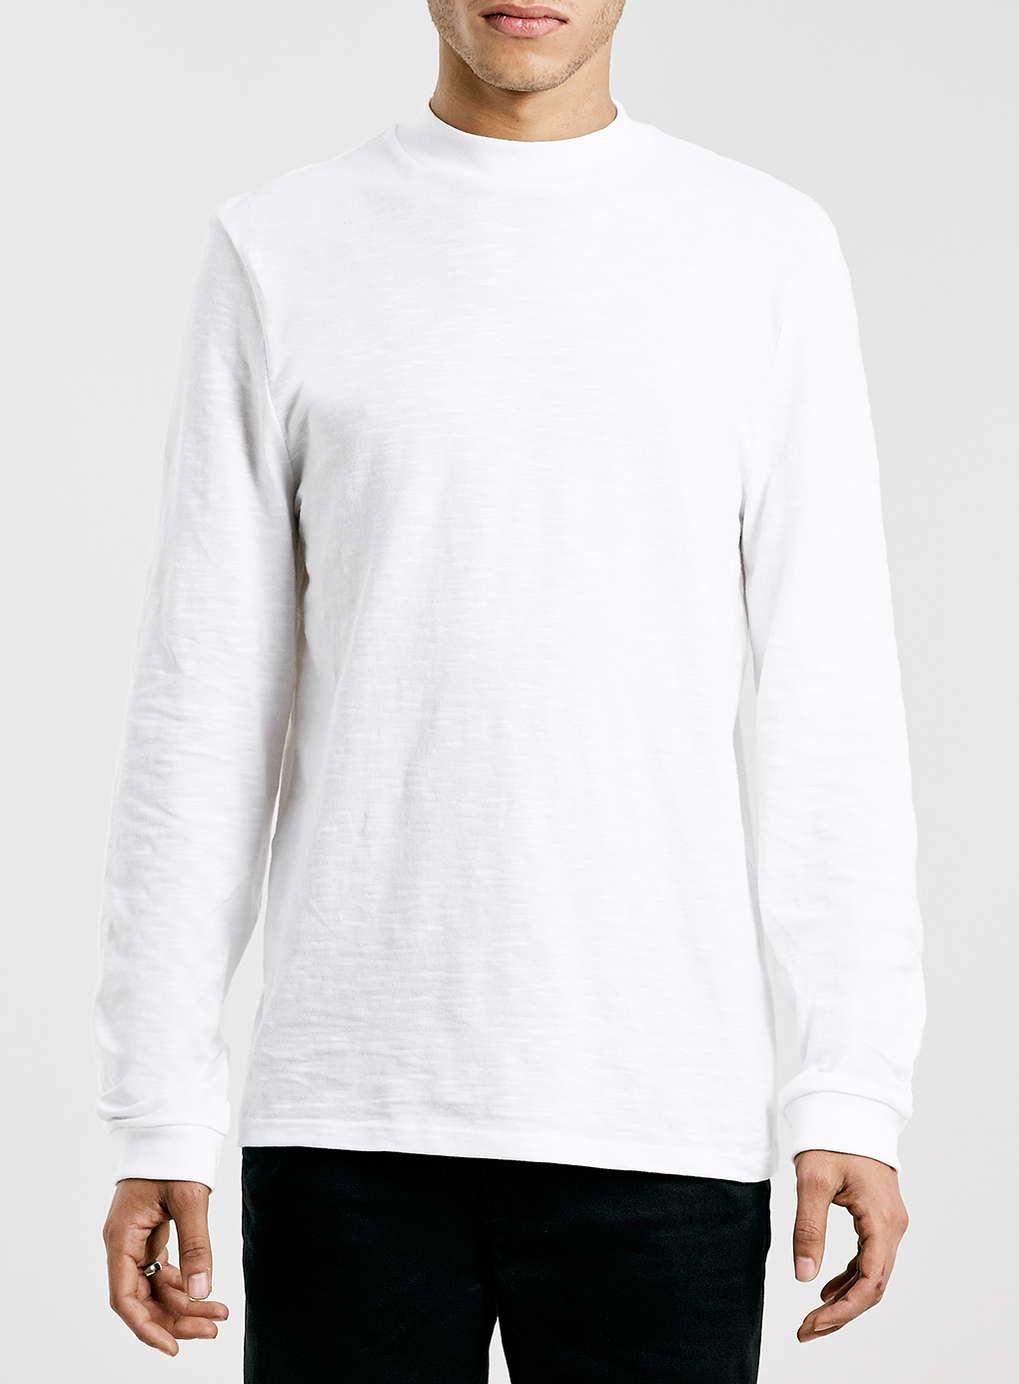 Topman White Slubby Turtle Neck Long Sleeve T Shirt In